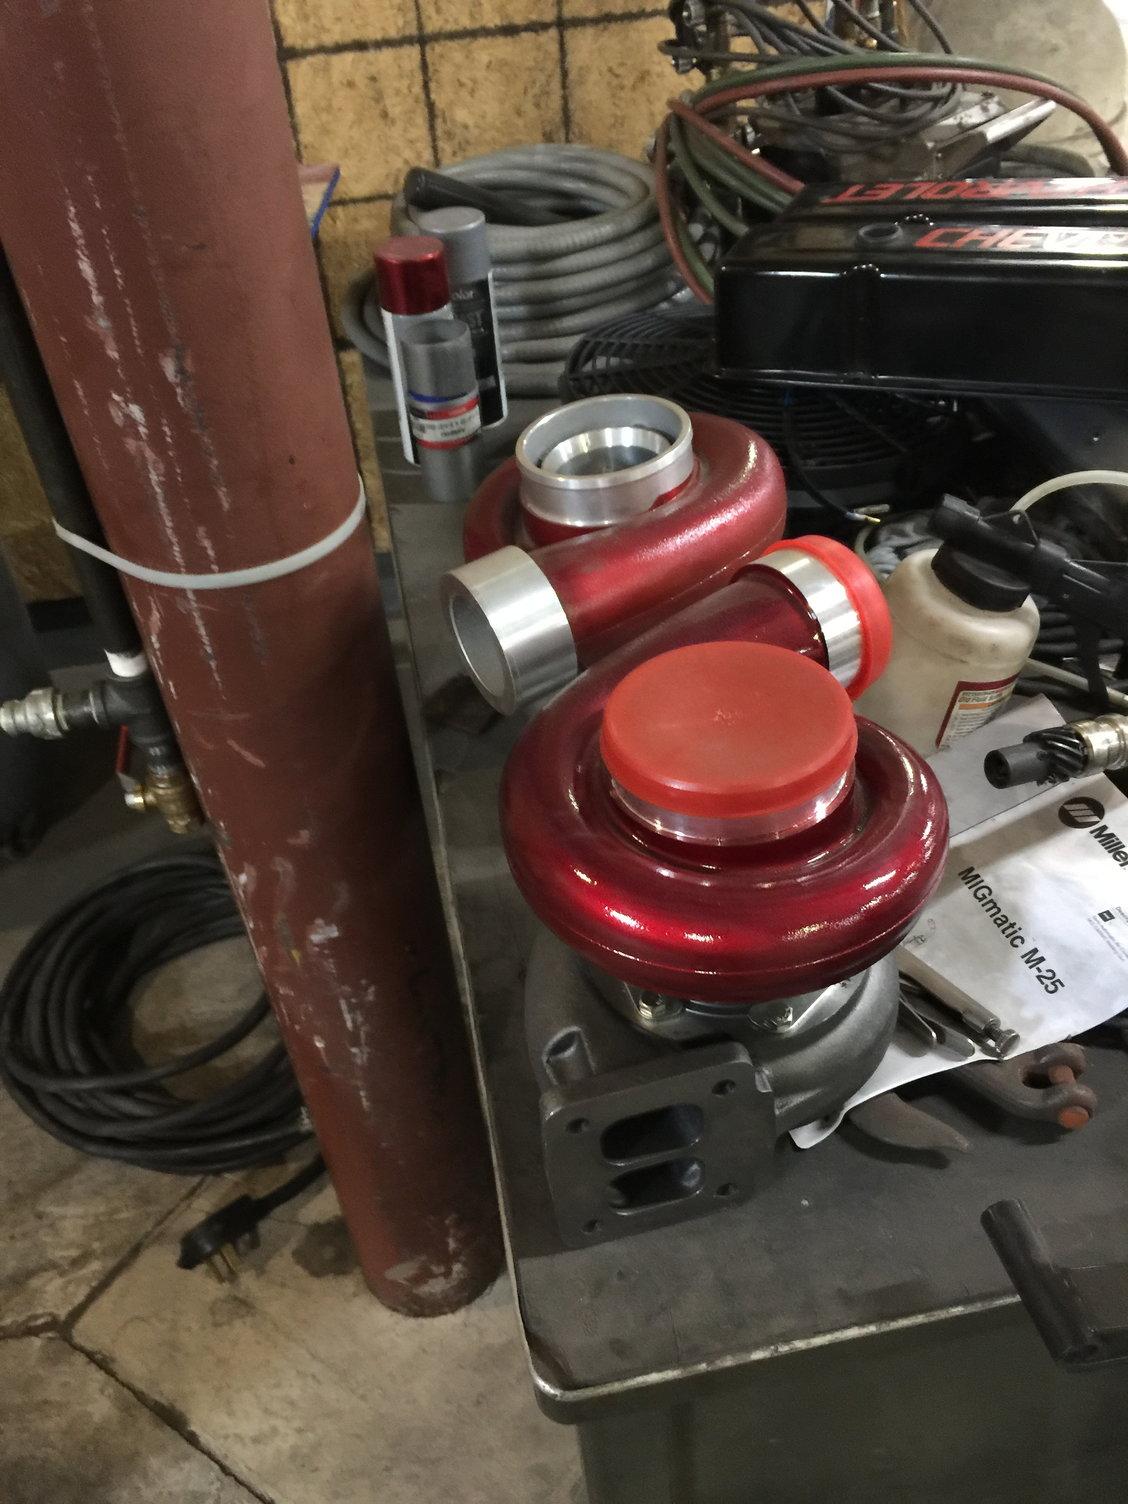 87 Camaro LT Turbo SBC - Third Generation F-Body Message Boards